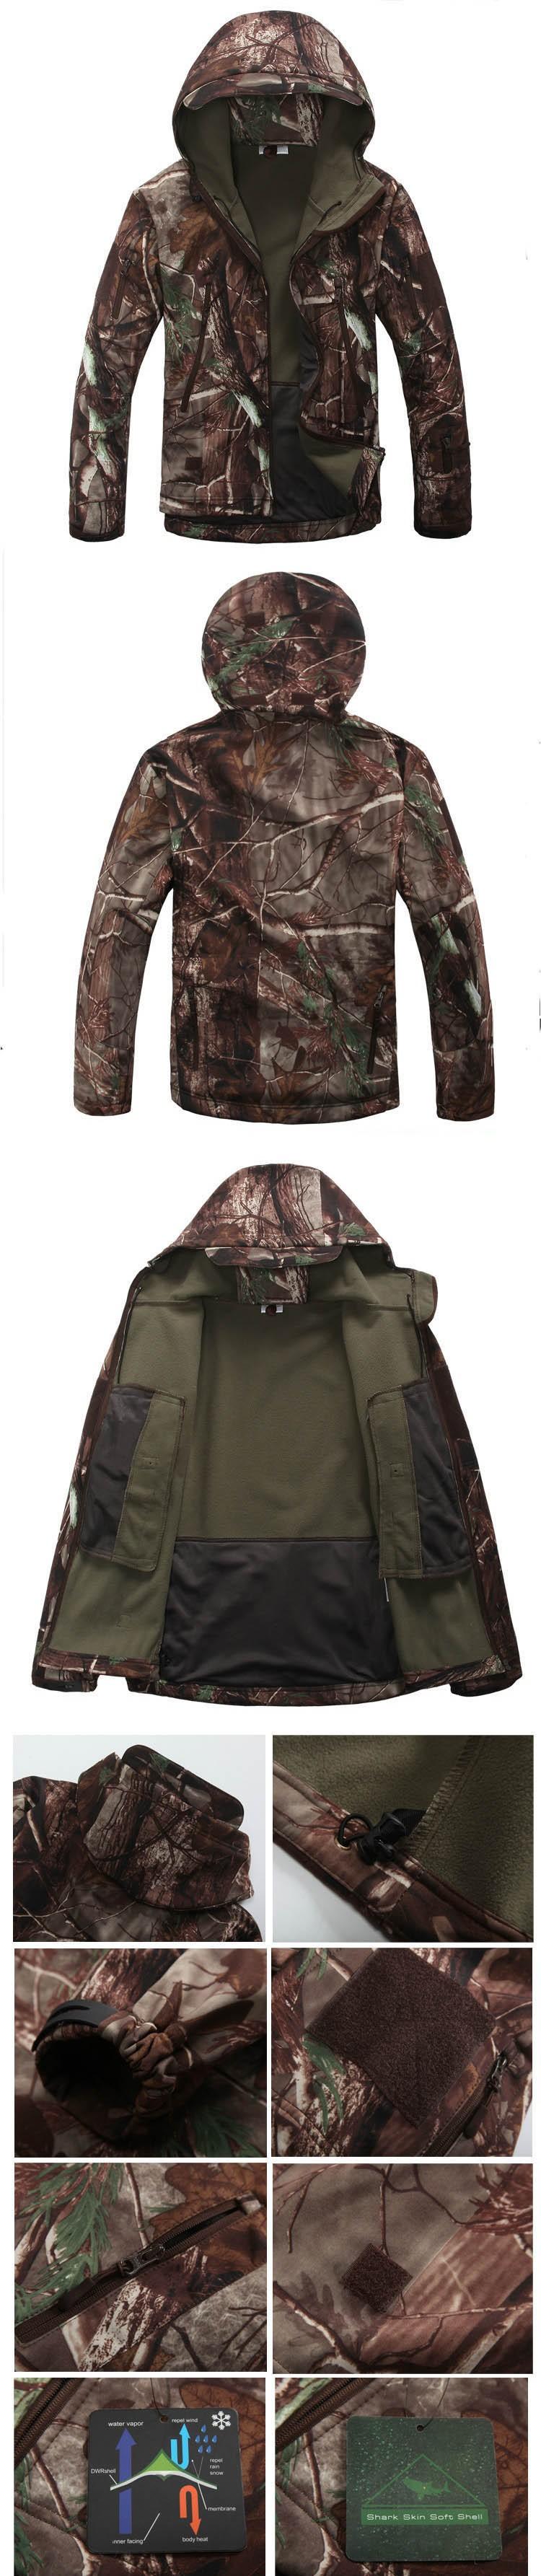 High Quality Lurker Shark Skin Soft Shell Tad V 40 Outdoor Military Jacket Inner Polar Safety Getsubject Aeproduct